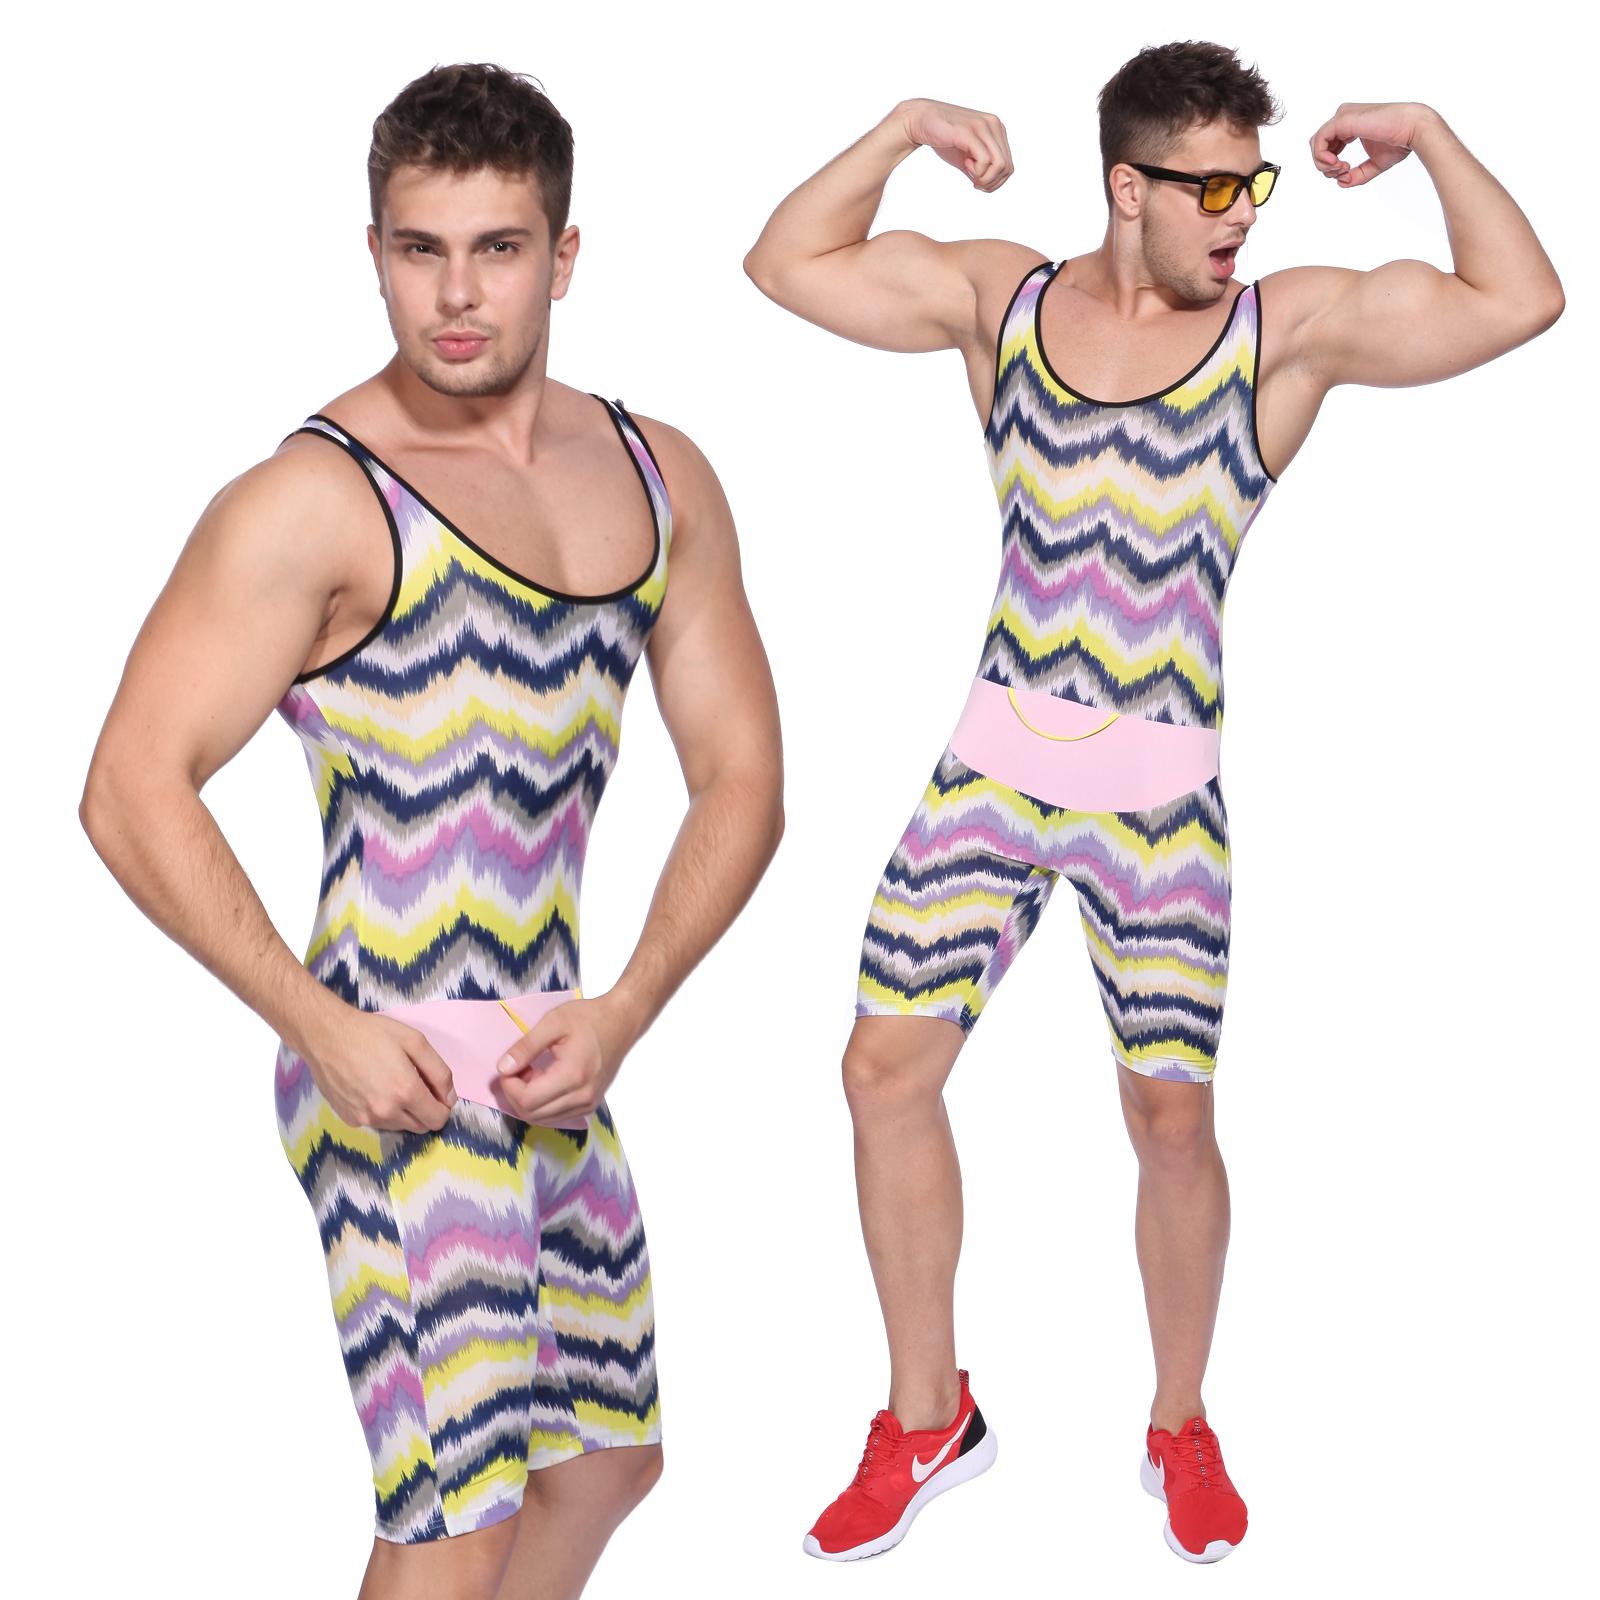 80s 90s Mr Motivator Energizer Fancy Dress Mens Gents Male Fitness - Does not apply